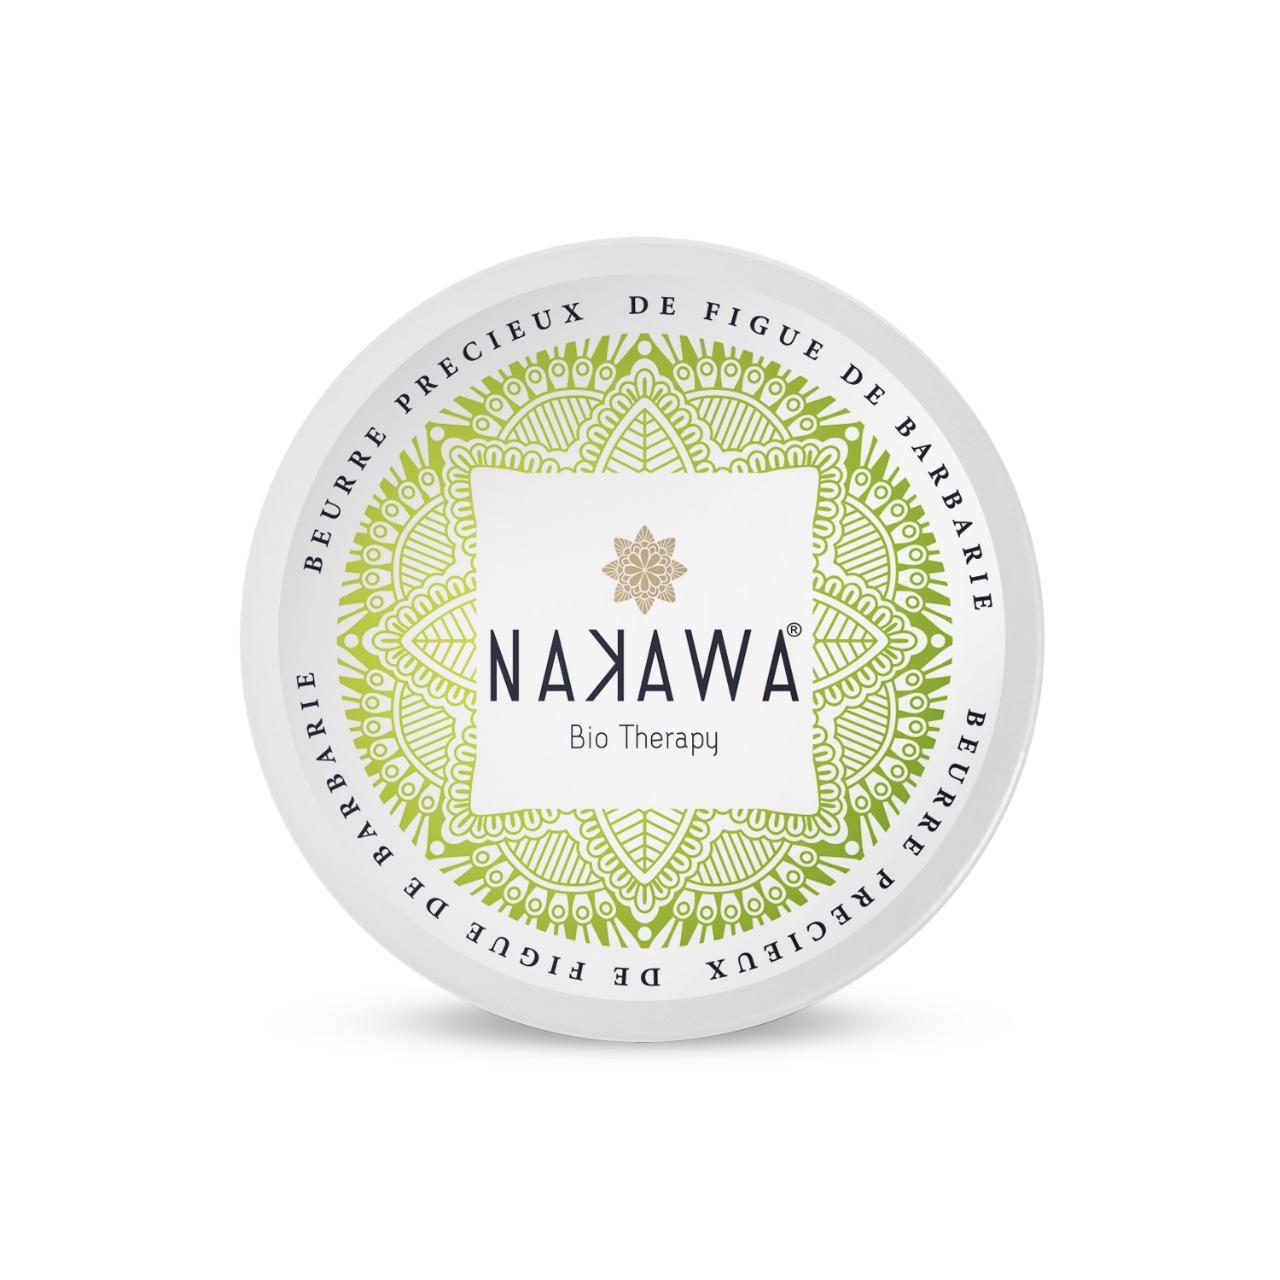 Beurre precieux de figue de barbarie - nuit Top- Nakawa Bio